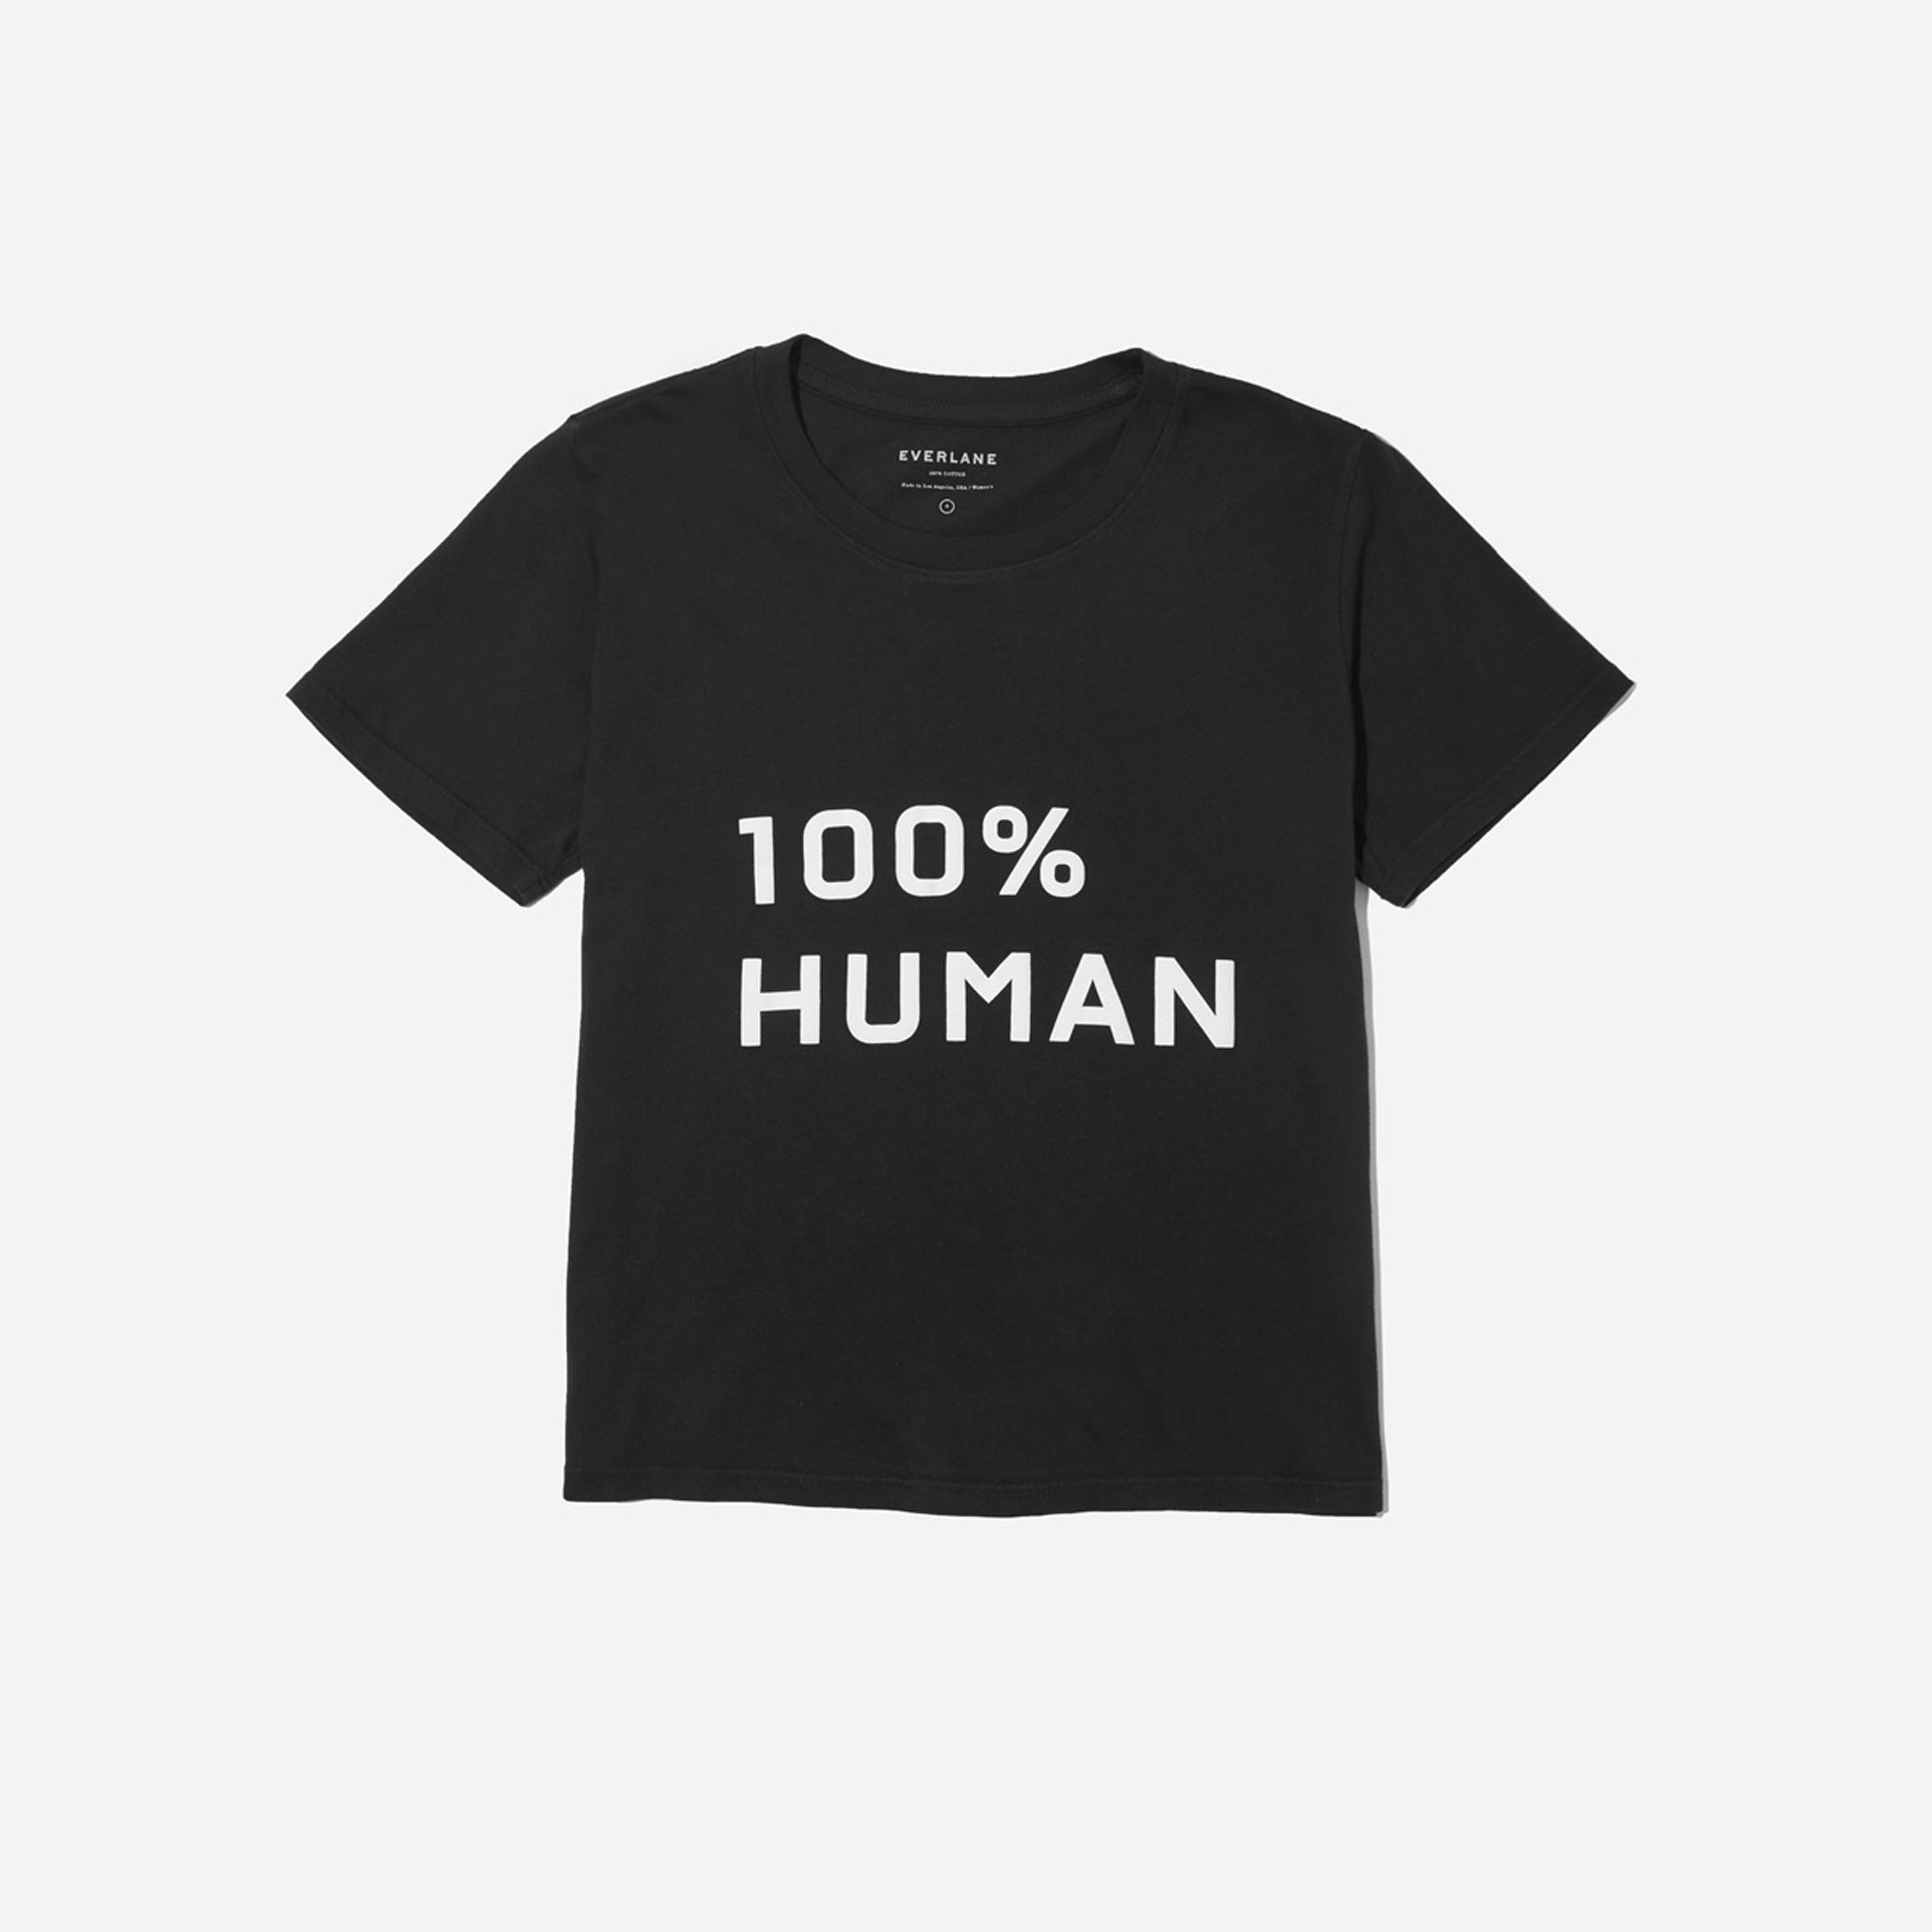 The 100% Human Box Cut Tee In Medium Print by Everlane